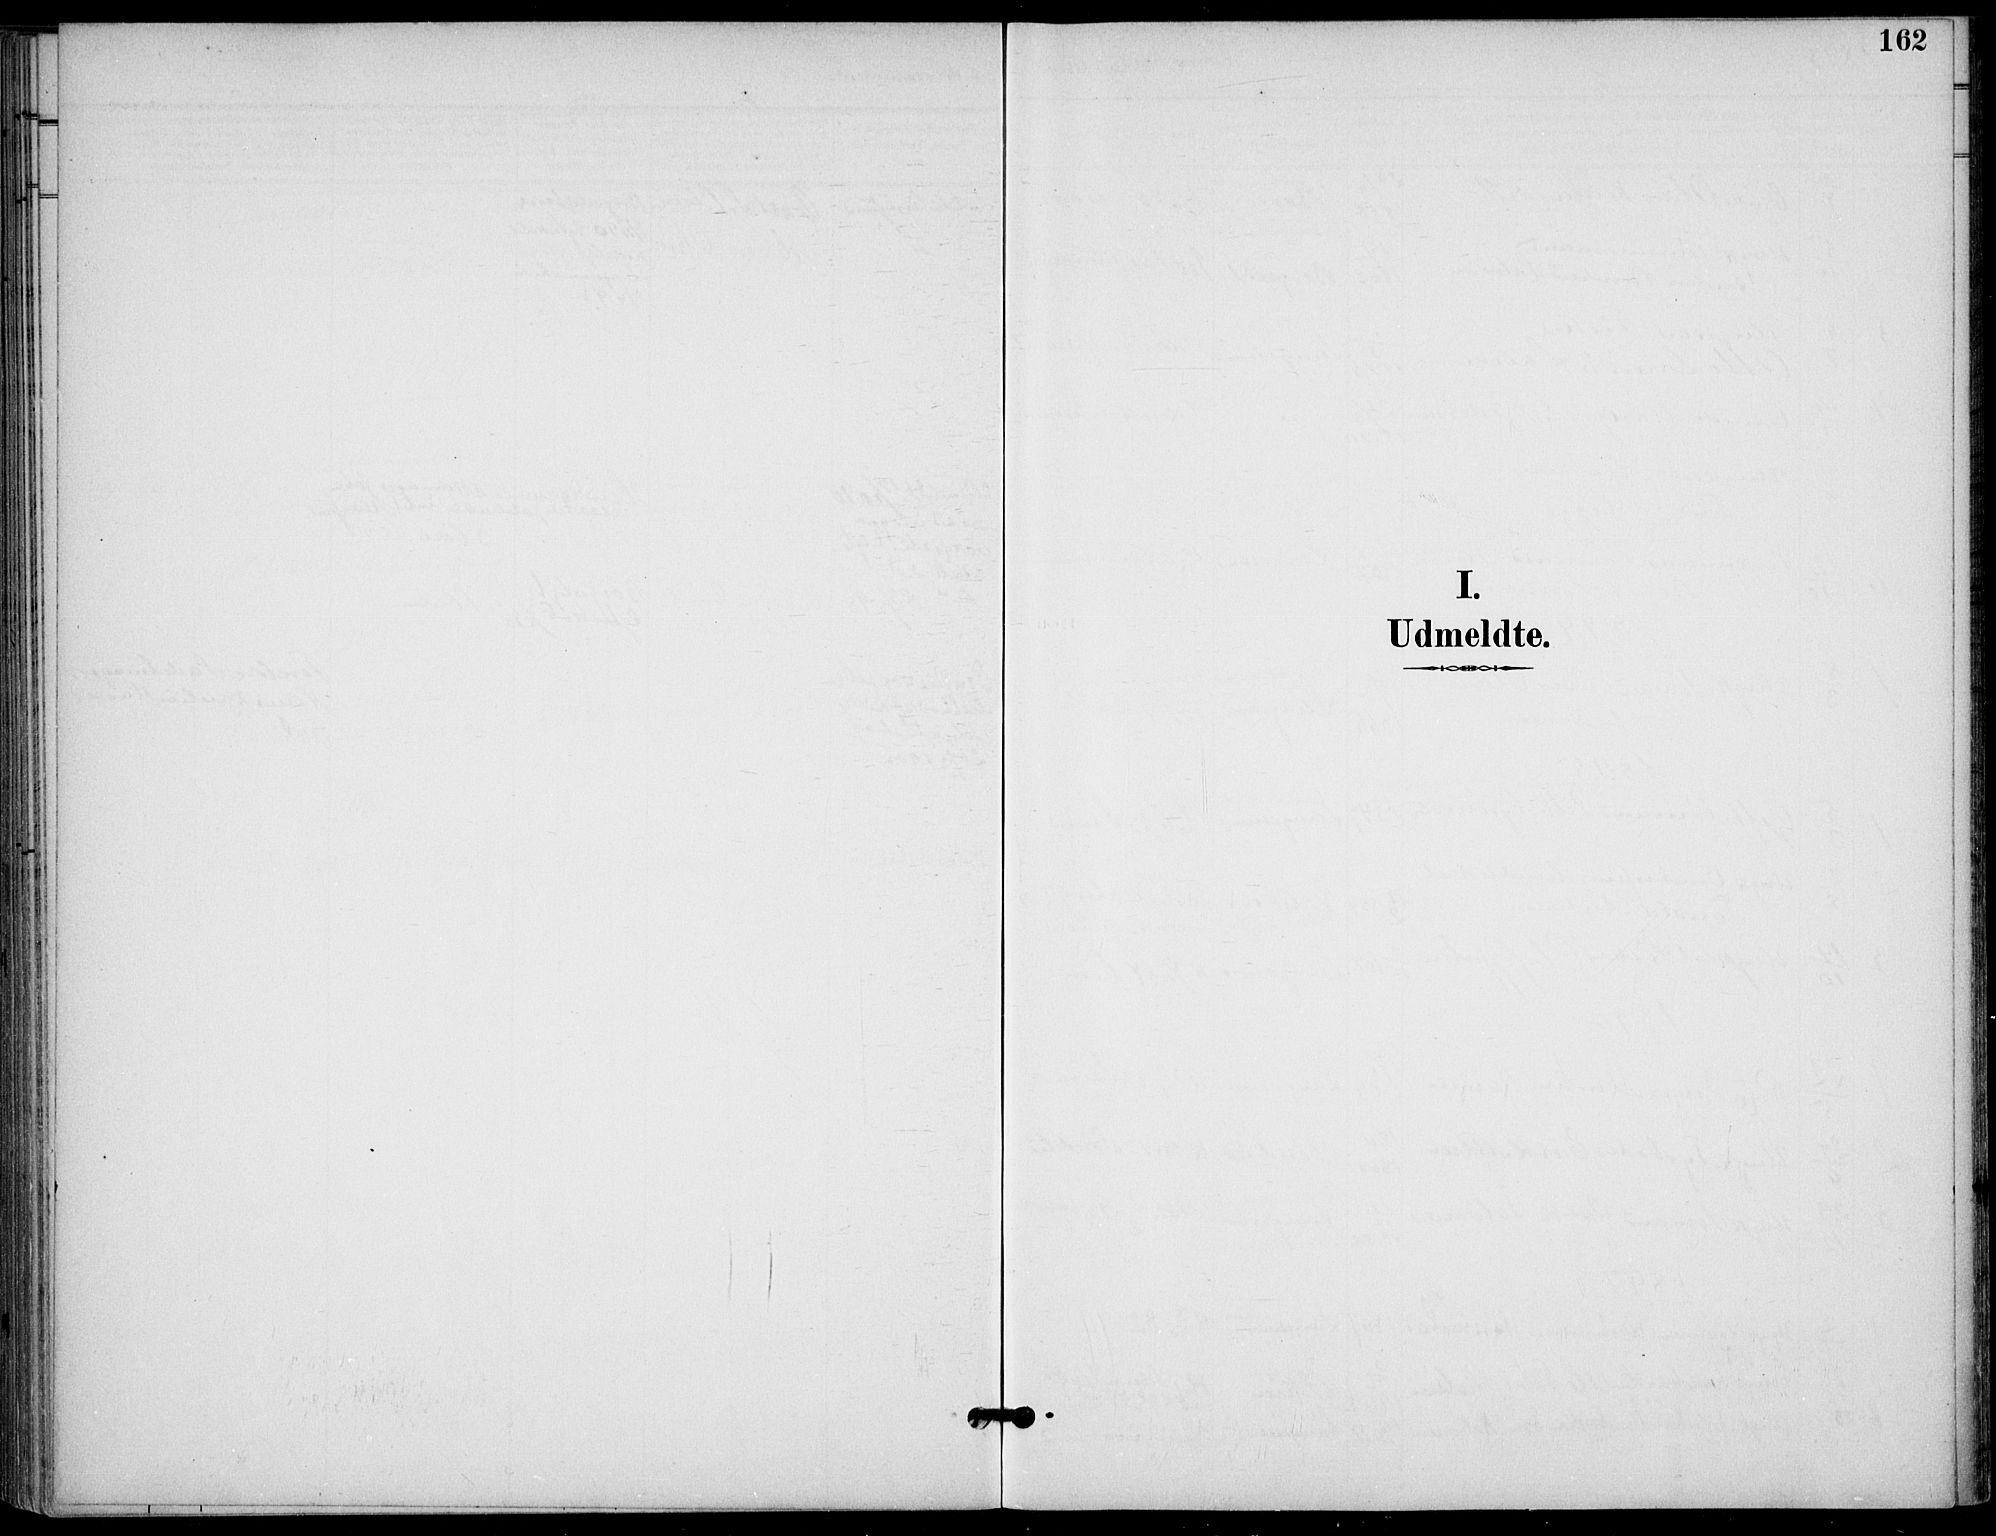 SAKO, Langesund kirkebøker, F/Fa/L0003: Ministerialbok nr. 3, 1893-1907, s. 162